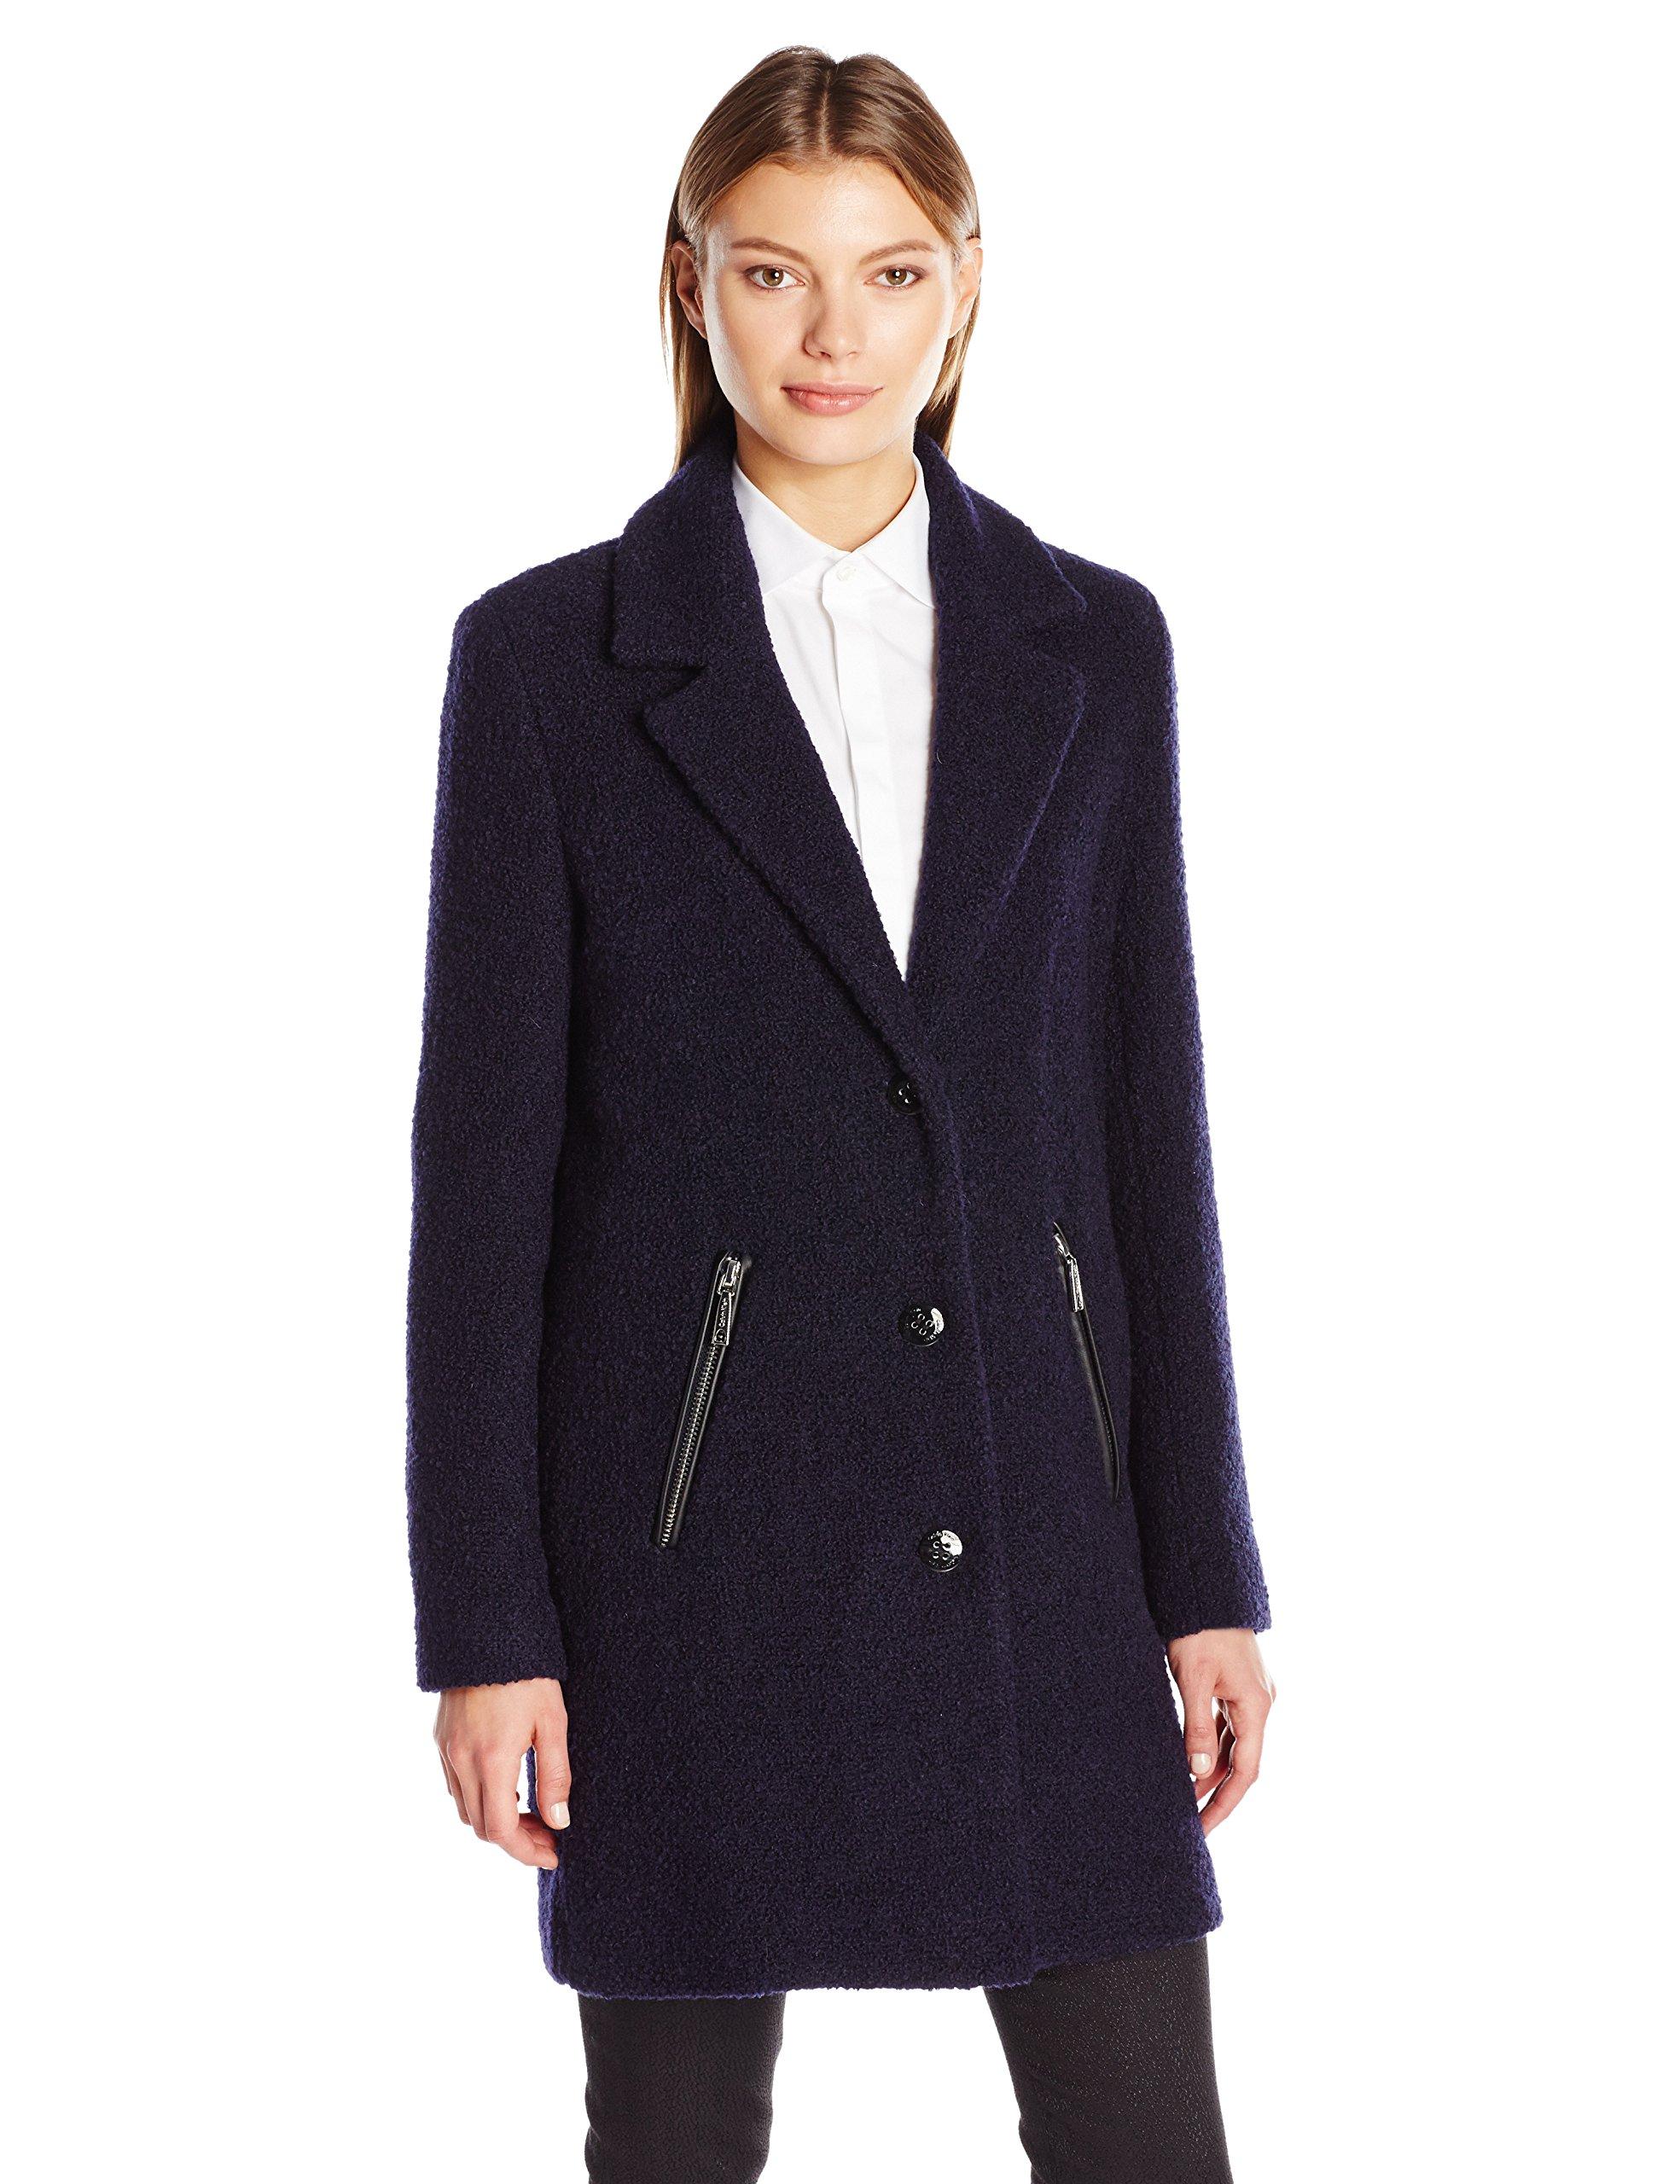 Calvin Klein Women's Boucle 3 Wool Coat with Button Closure, Indigo, M by Calvin Klein